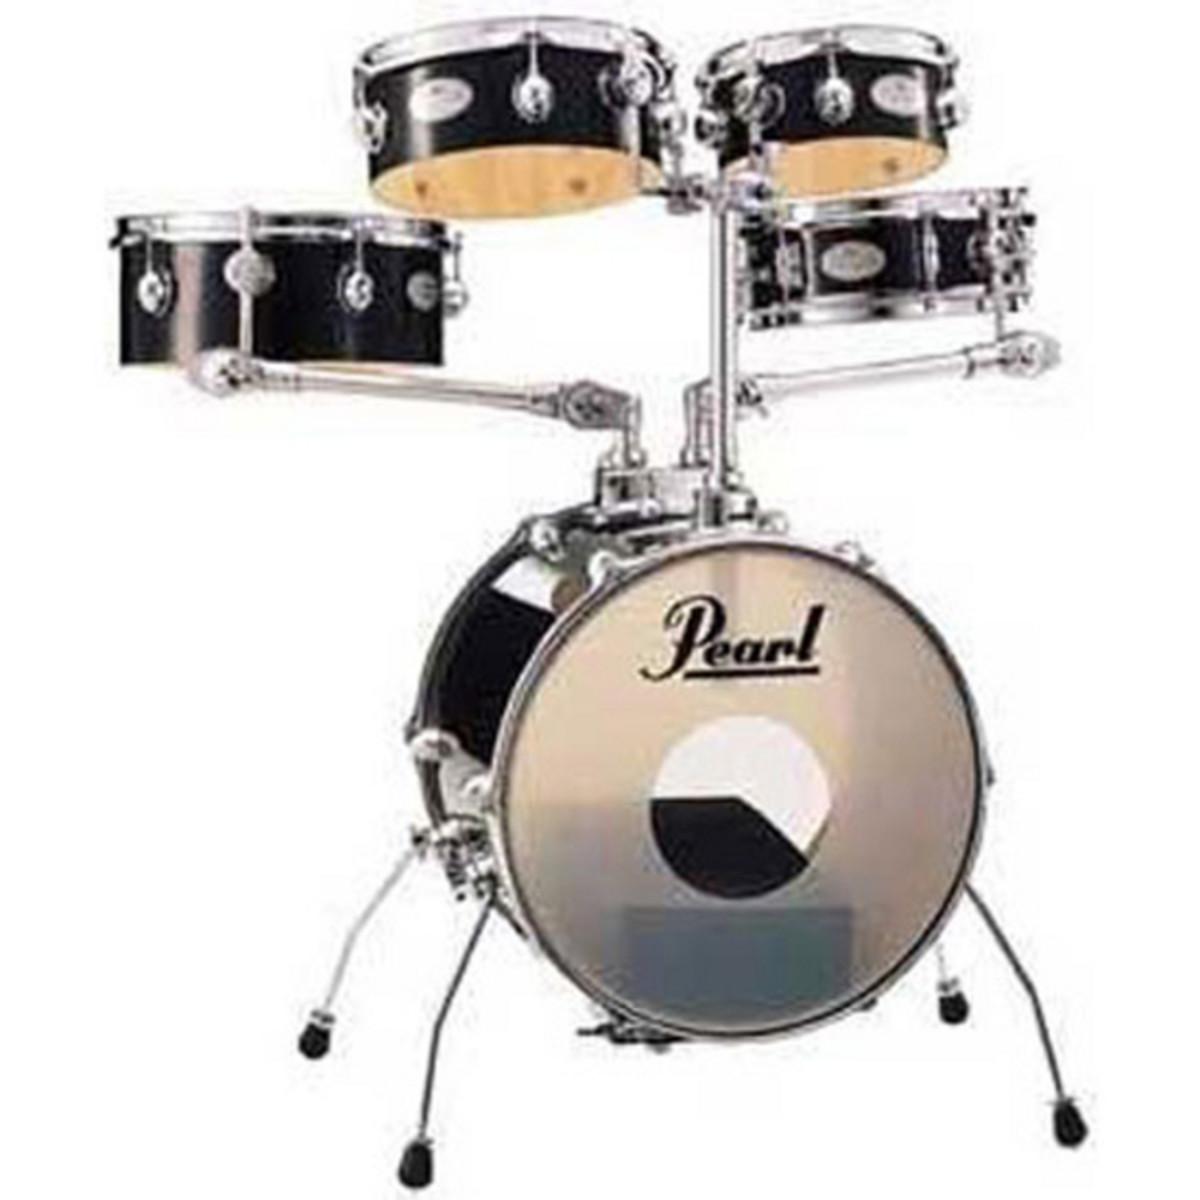 pearl rhythm traveler rgt665 gig kit jet black nearly new at. Black Bedroom Furniture Sets. Home Design Ideas